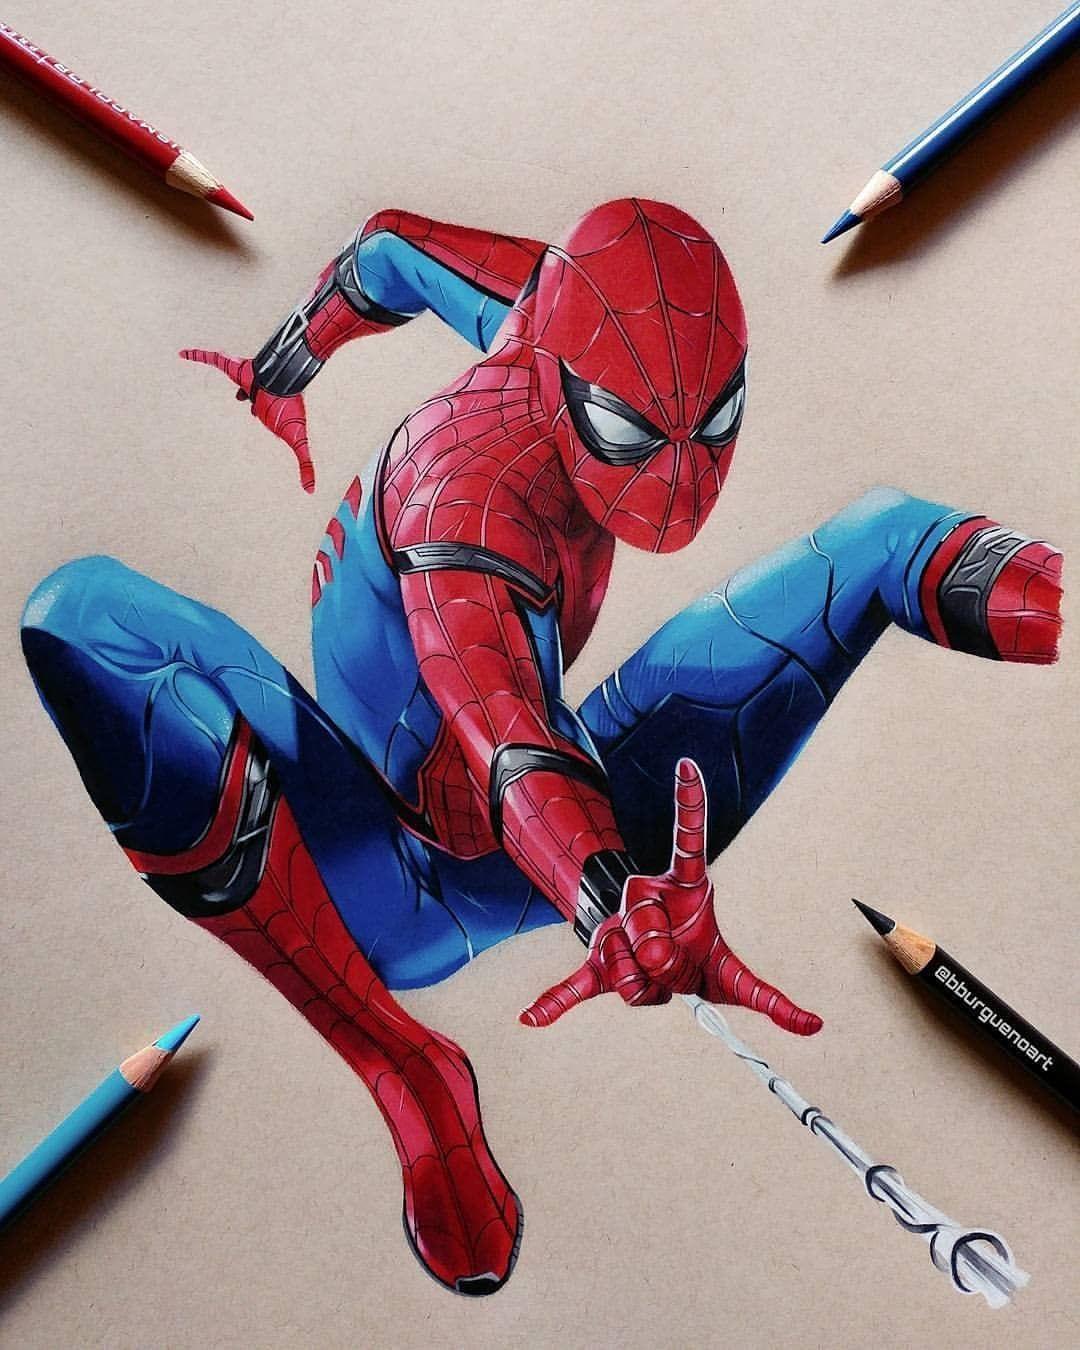 Credits Ironmanclub Comics Movies Games Marvelart Avengers Captainamerica Ironman Hulk Tho Spiderman Drawing Spiderman Artwork Marvel Comics Wallpaper